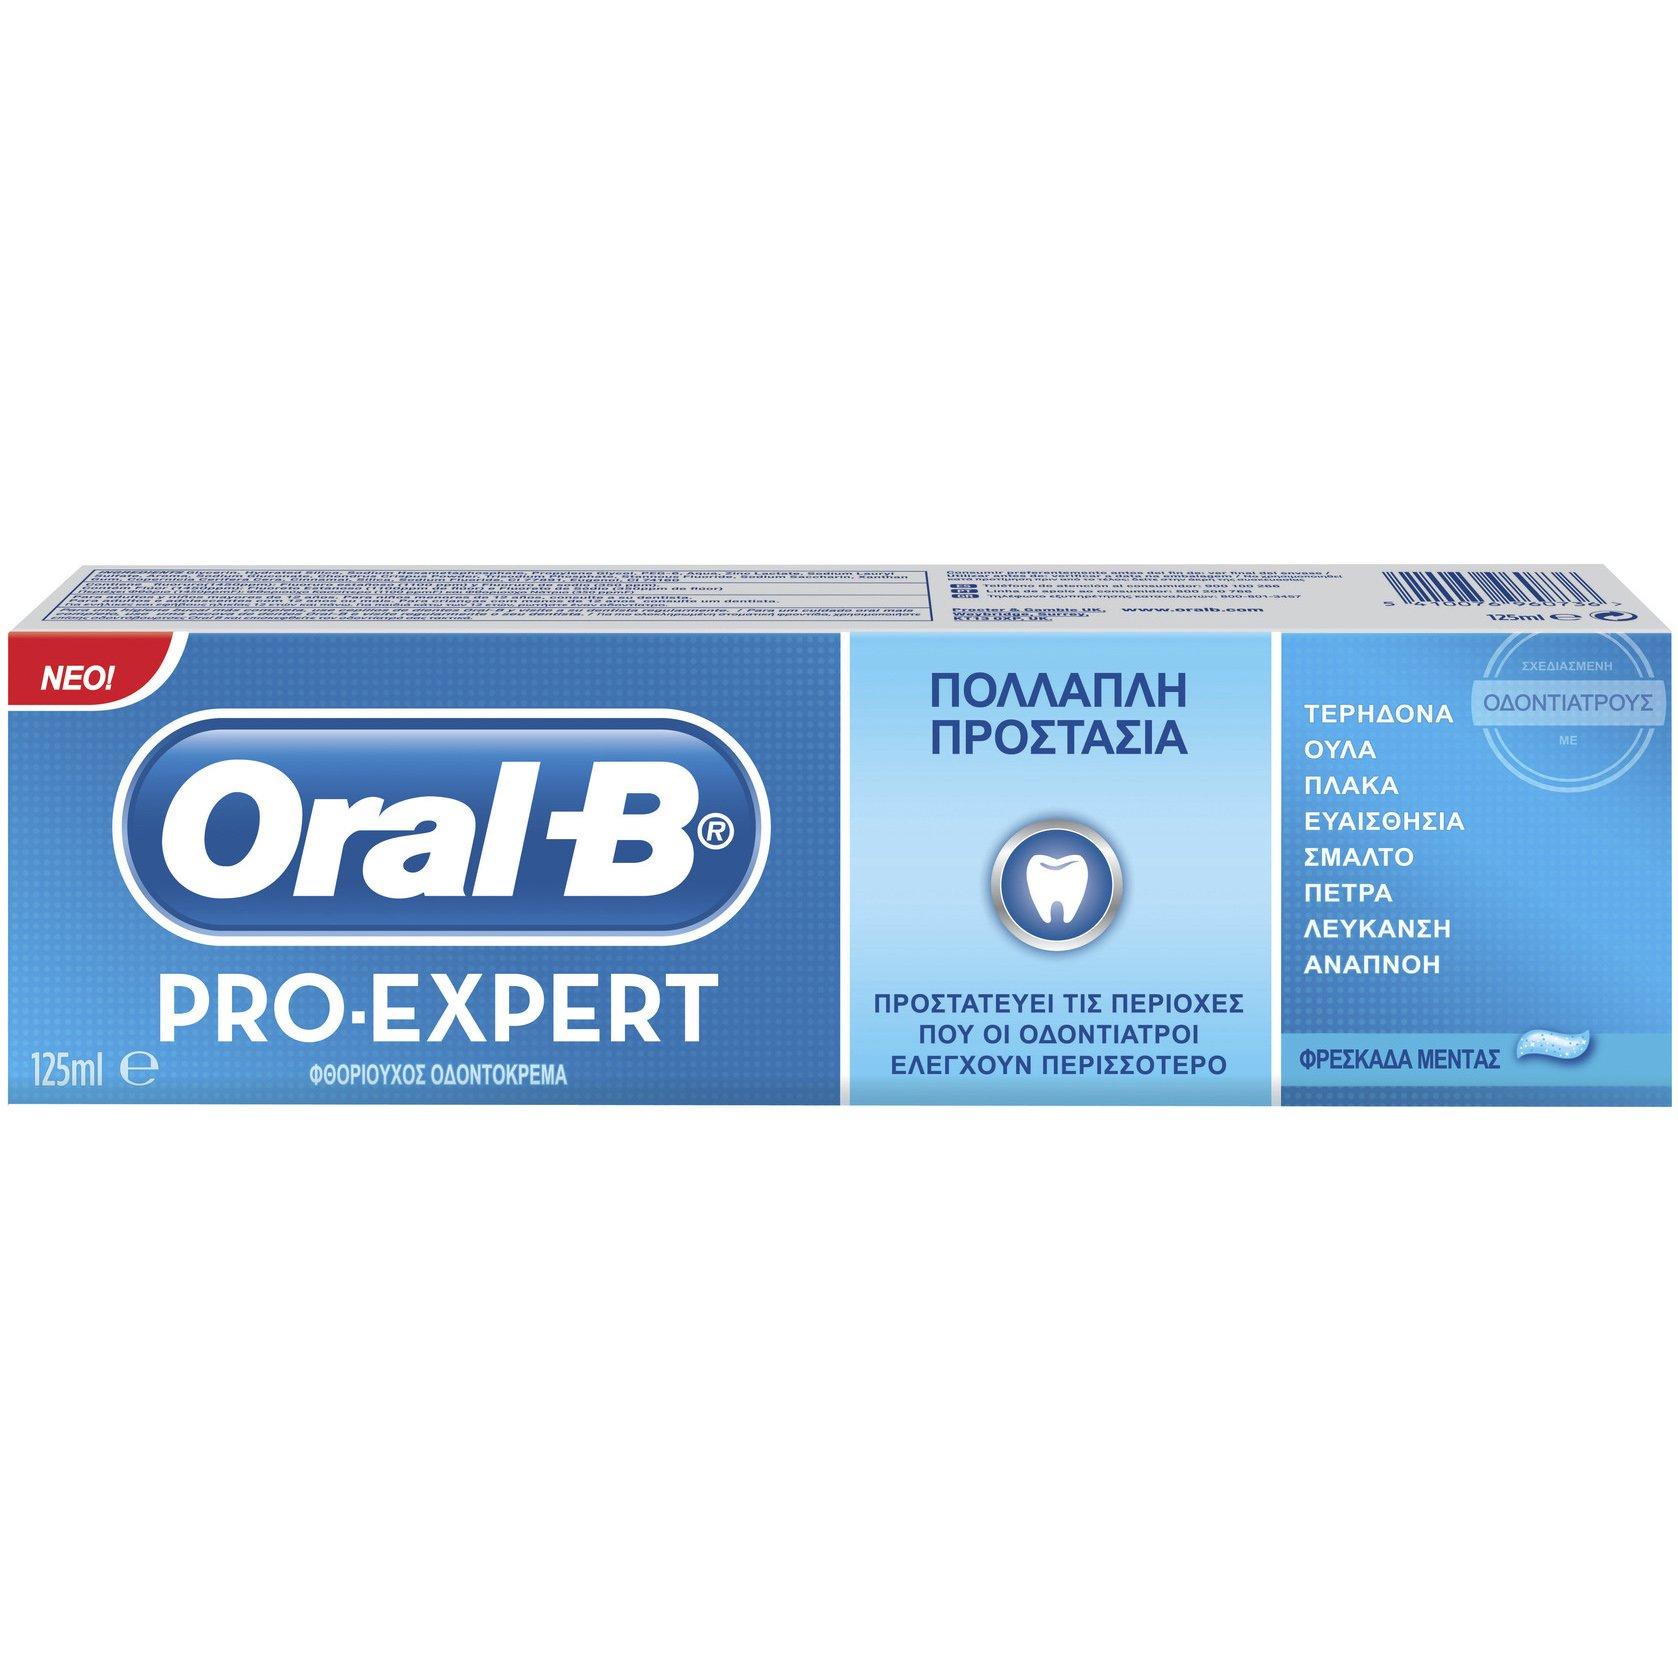 Oral-B Pro-Expert Οδοντόκρεμα Πολλαπλής Προστασίας 125ml